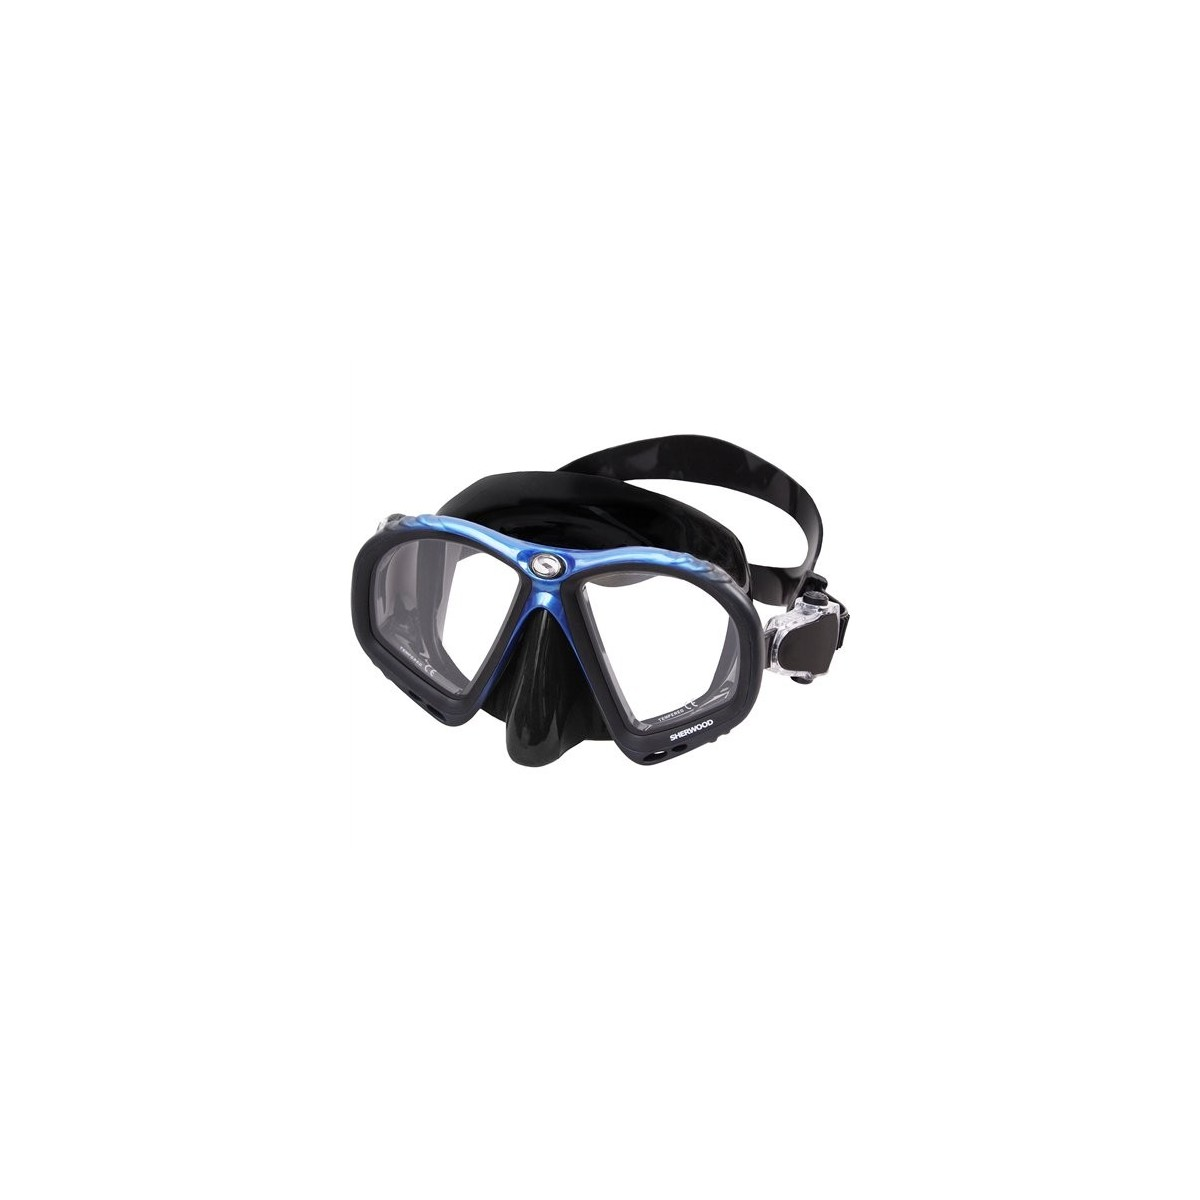 Sherwood ALLURE - MA09 Mask